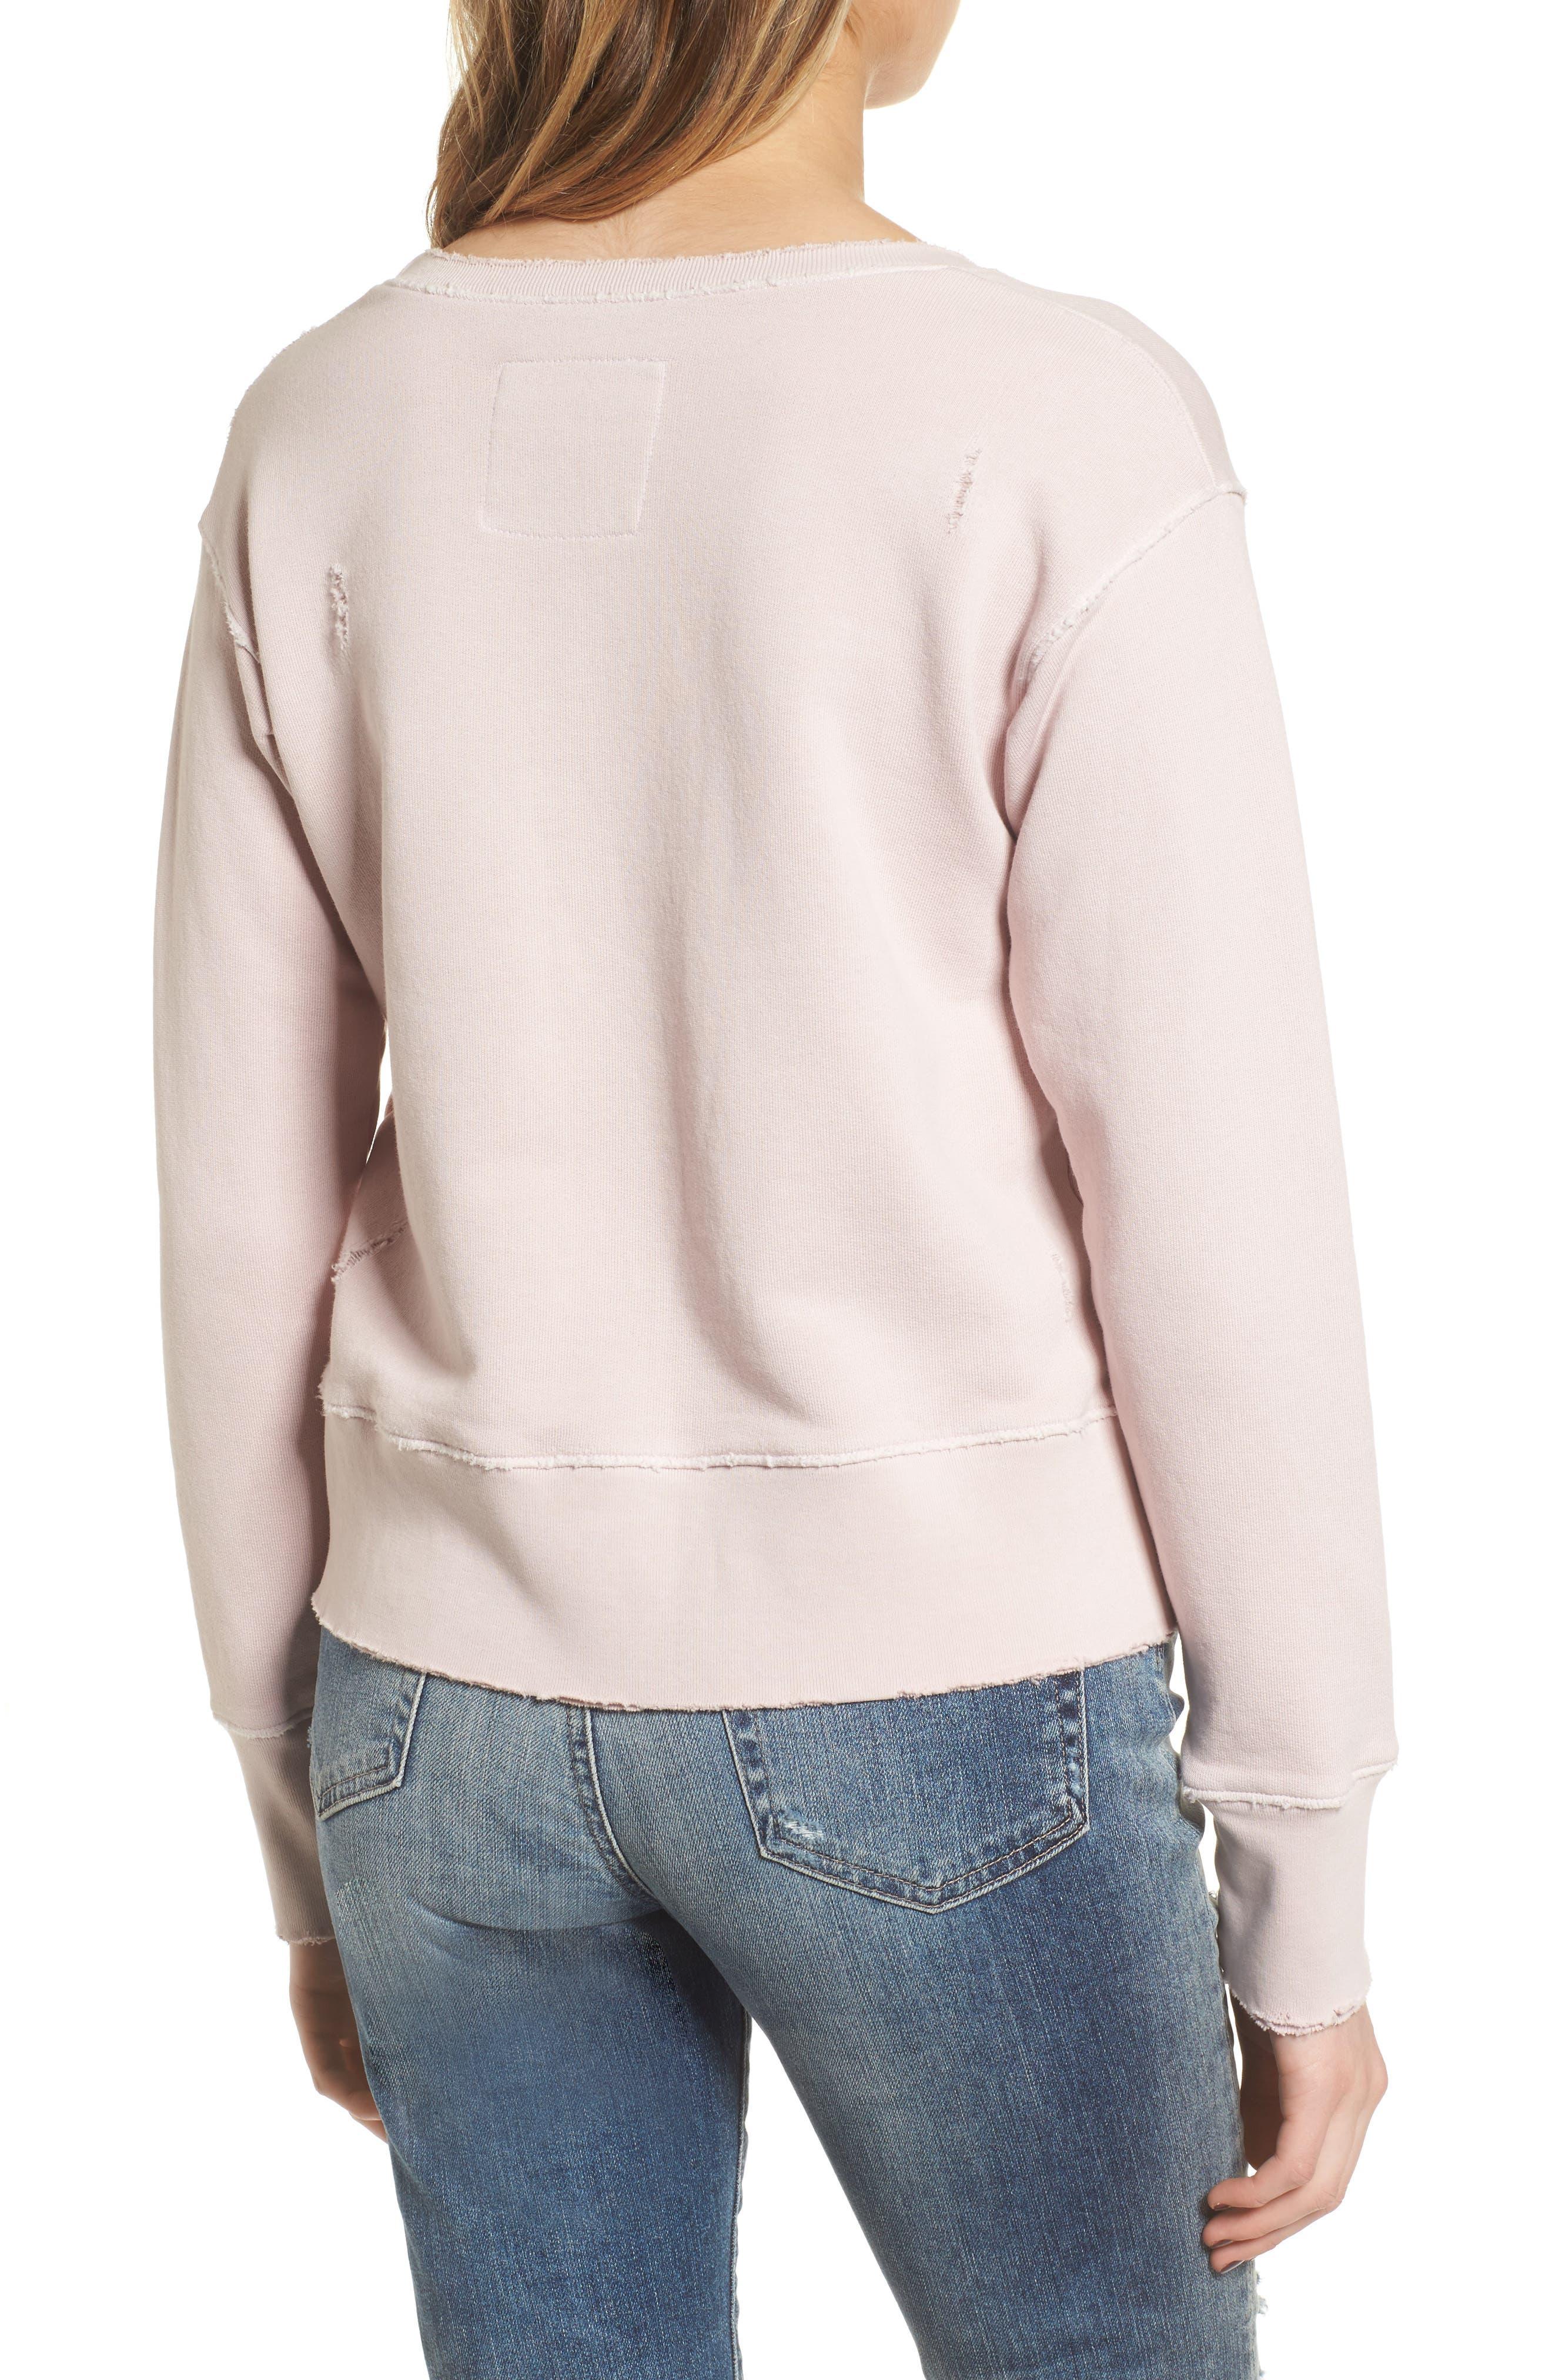 Tee Lab Cotton Sweatshirt,                             Alternate thumbnail 2, color,                             Bazooka 10 Year Vintage Wash